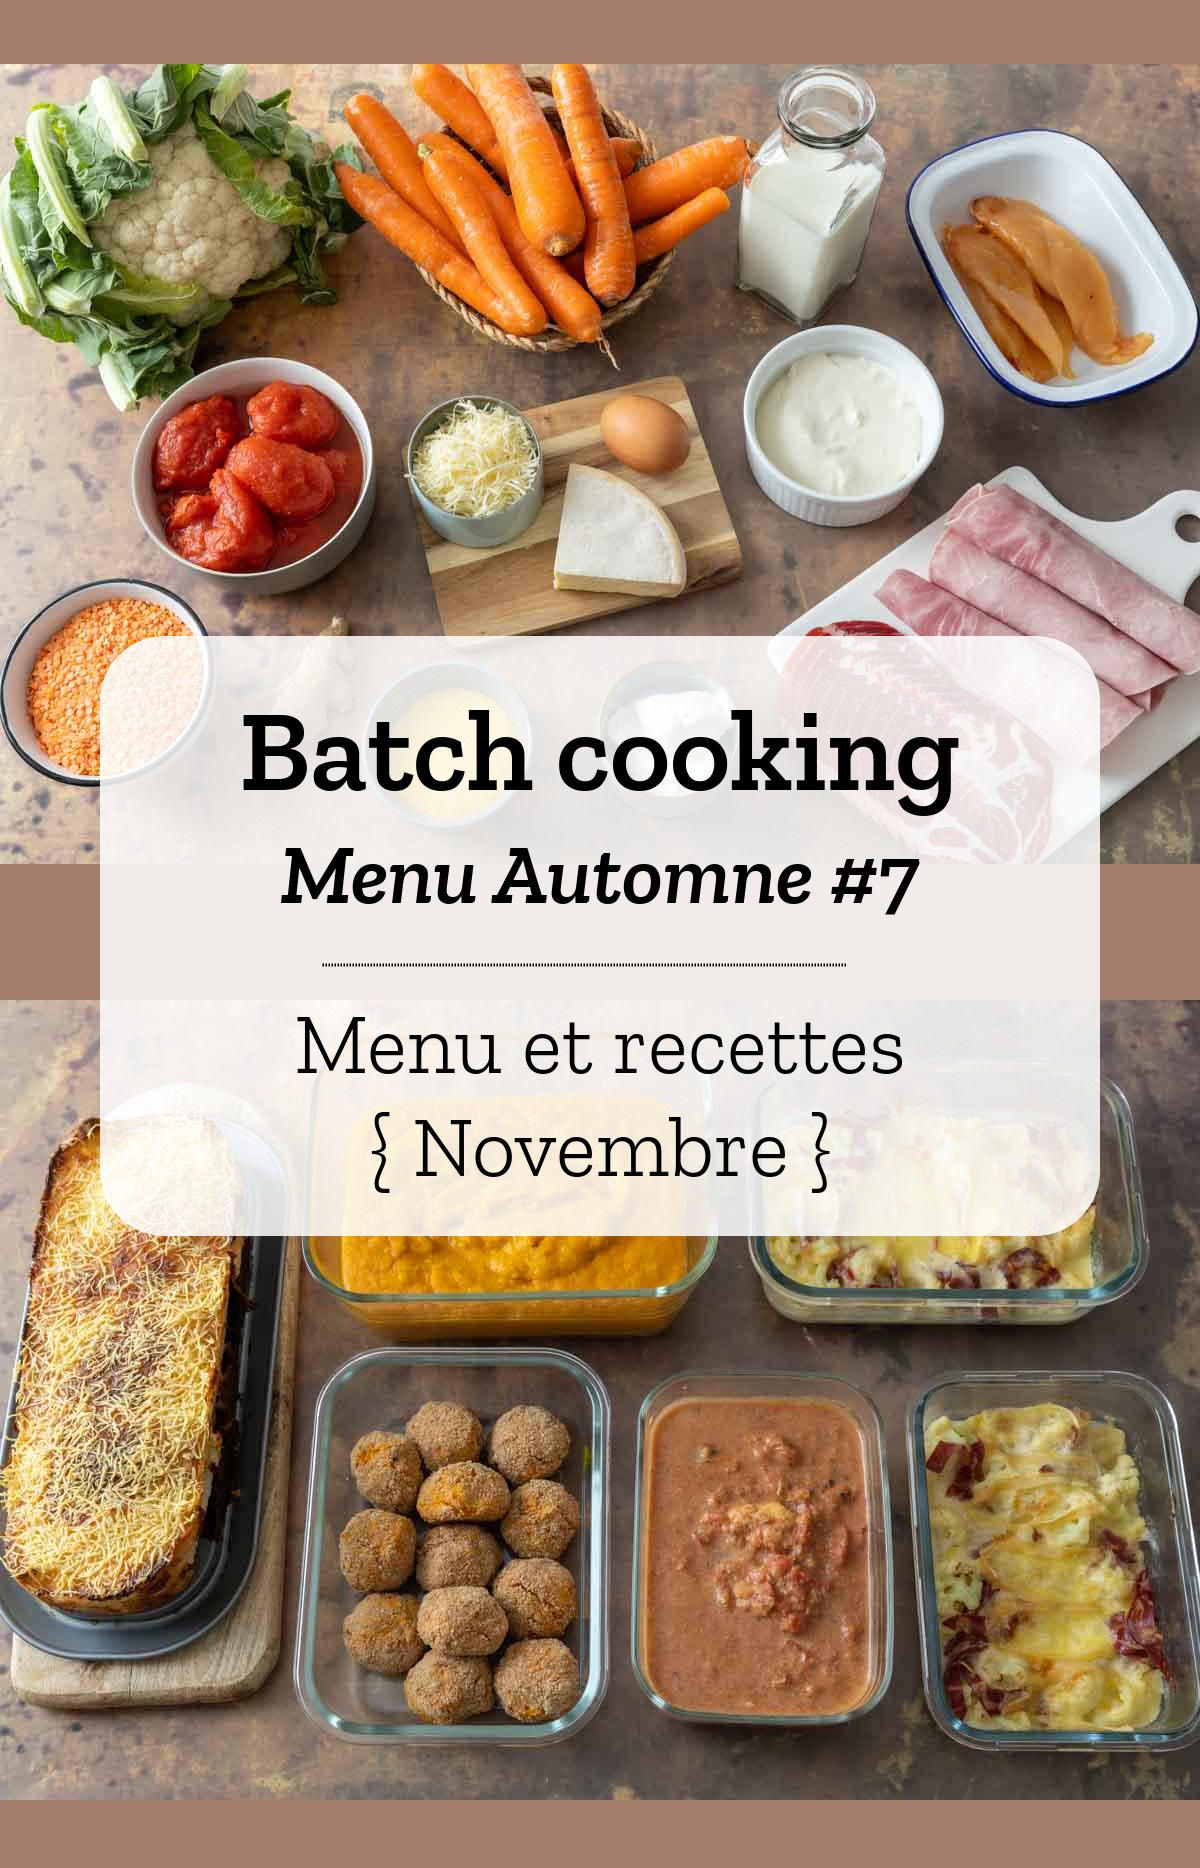 Batch cooking Automne 7 \u2013 Mois de Novembre \u2013 Semaine 45